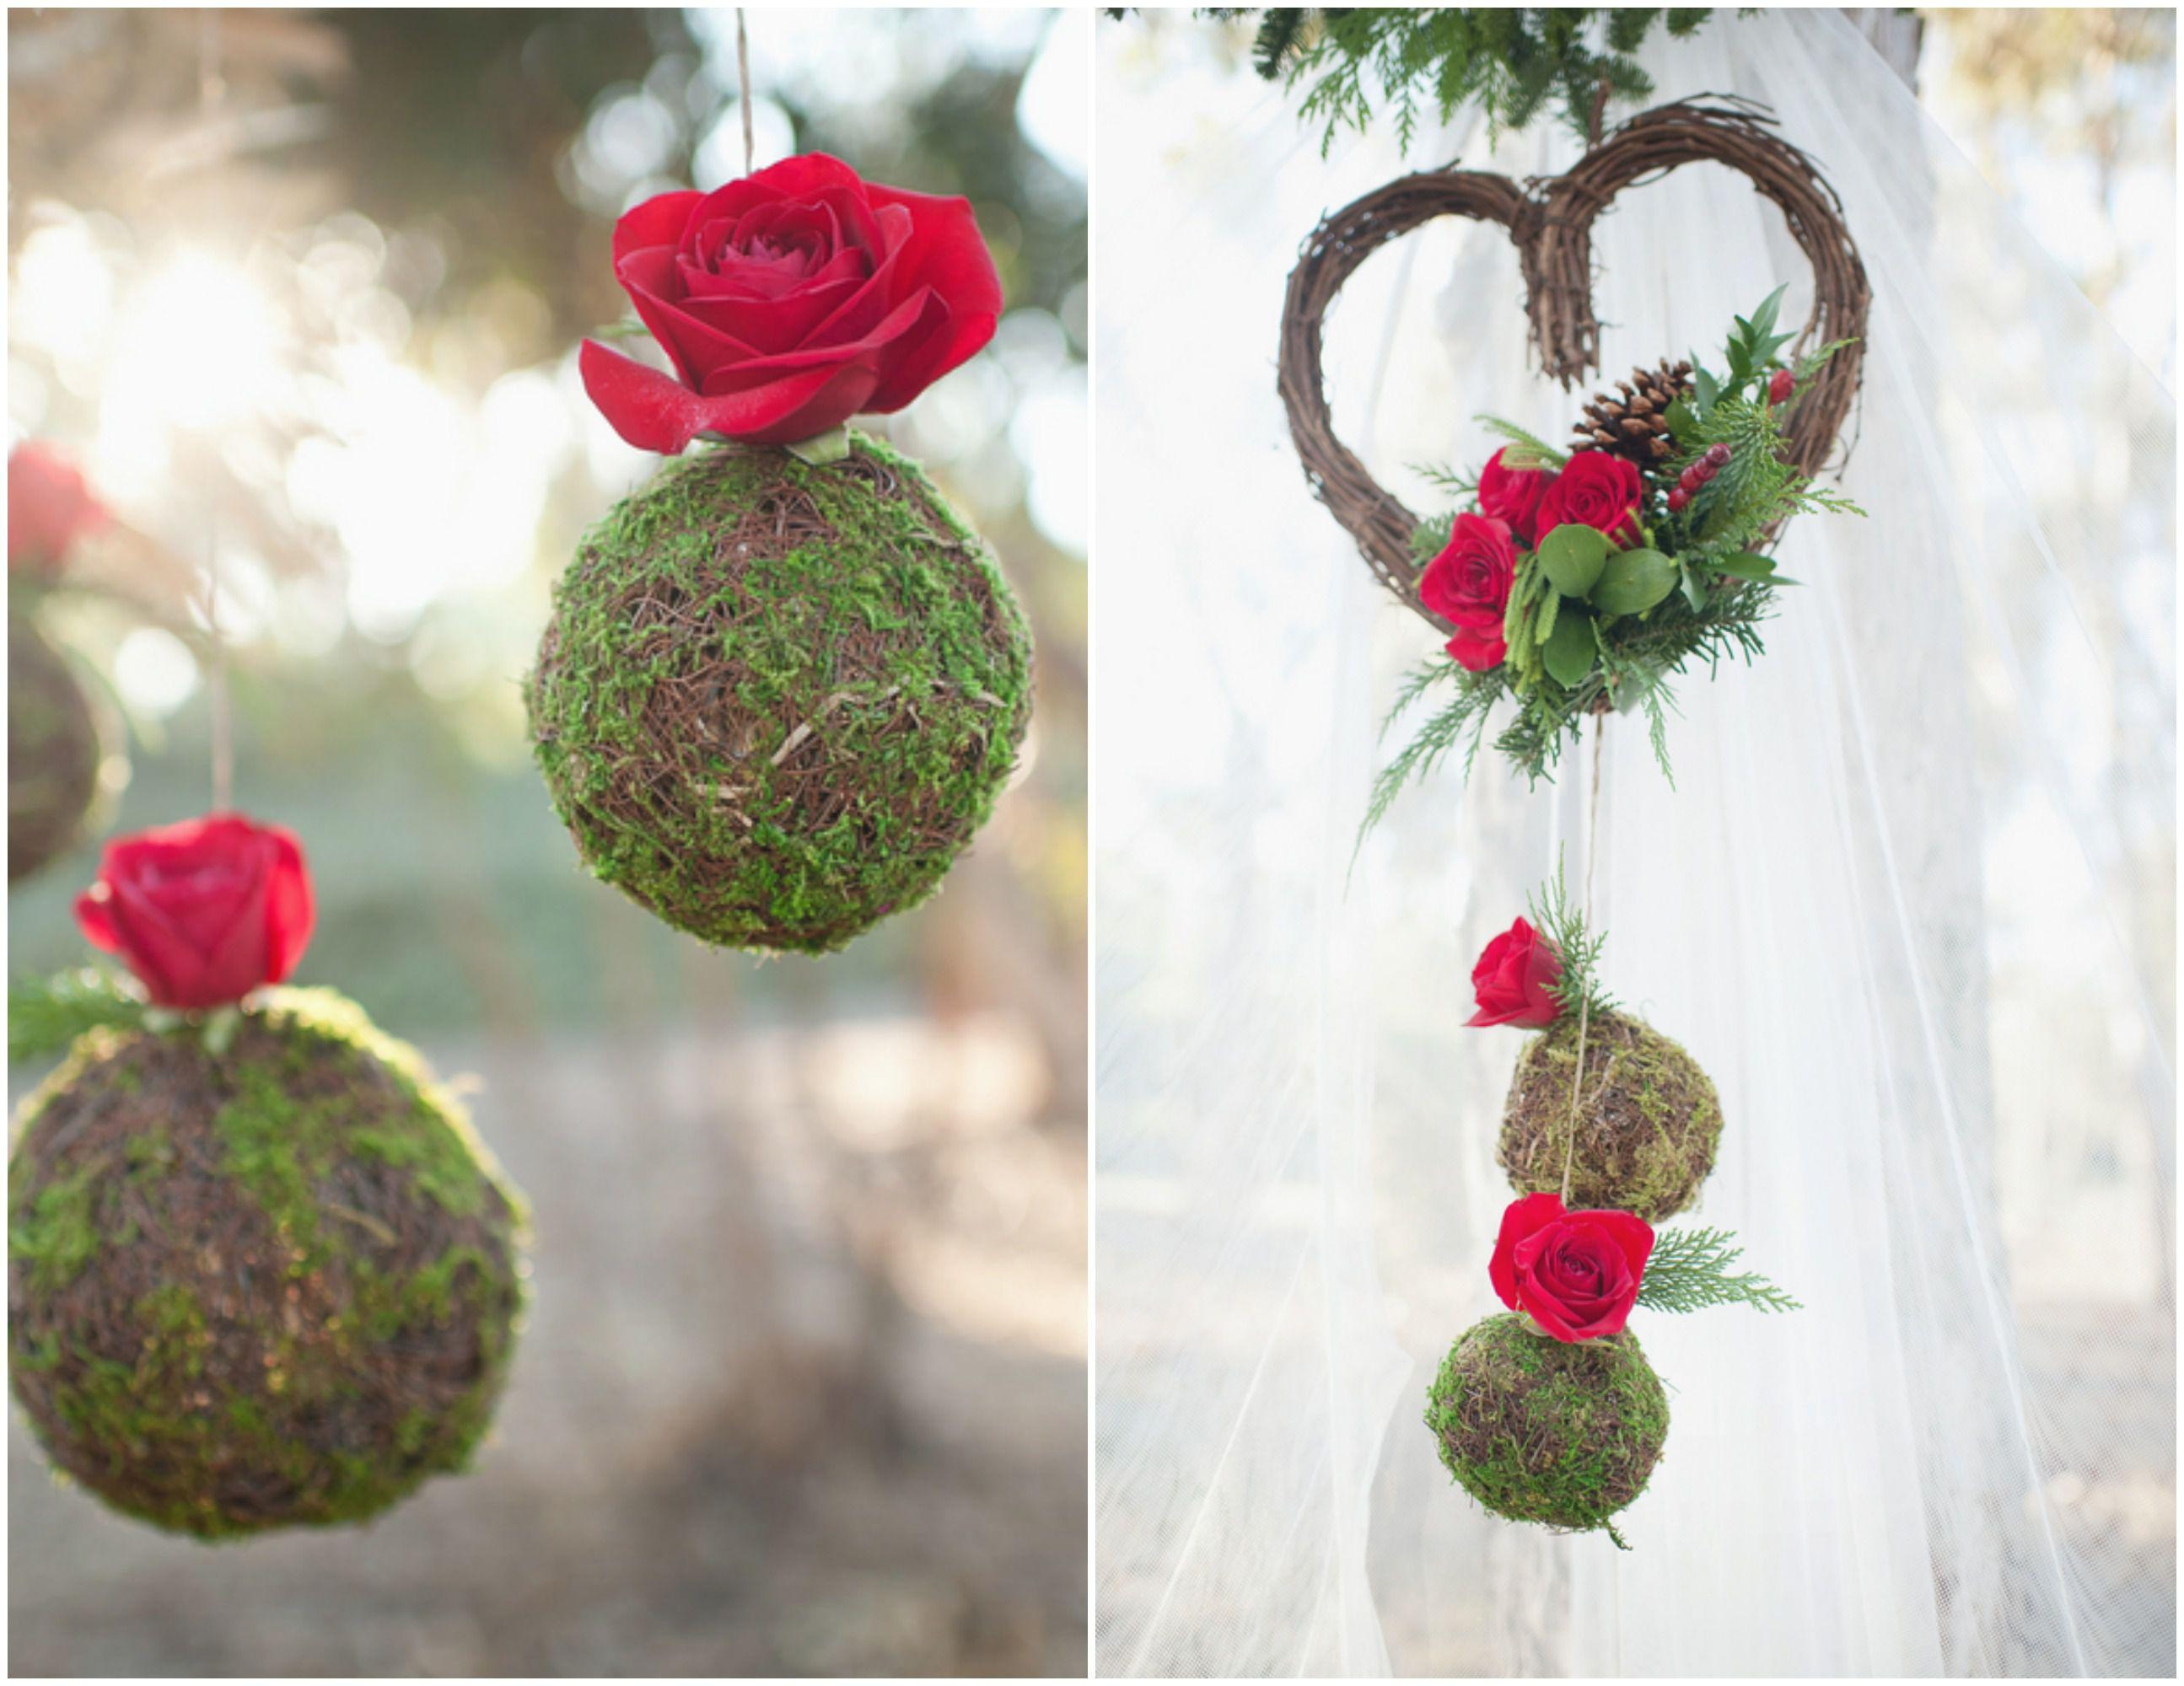 Winter Rustic Wedding Ideas - Rustic Wedding Chic